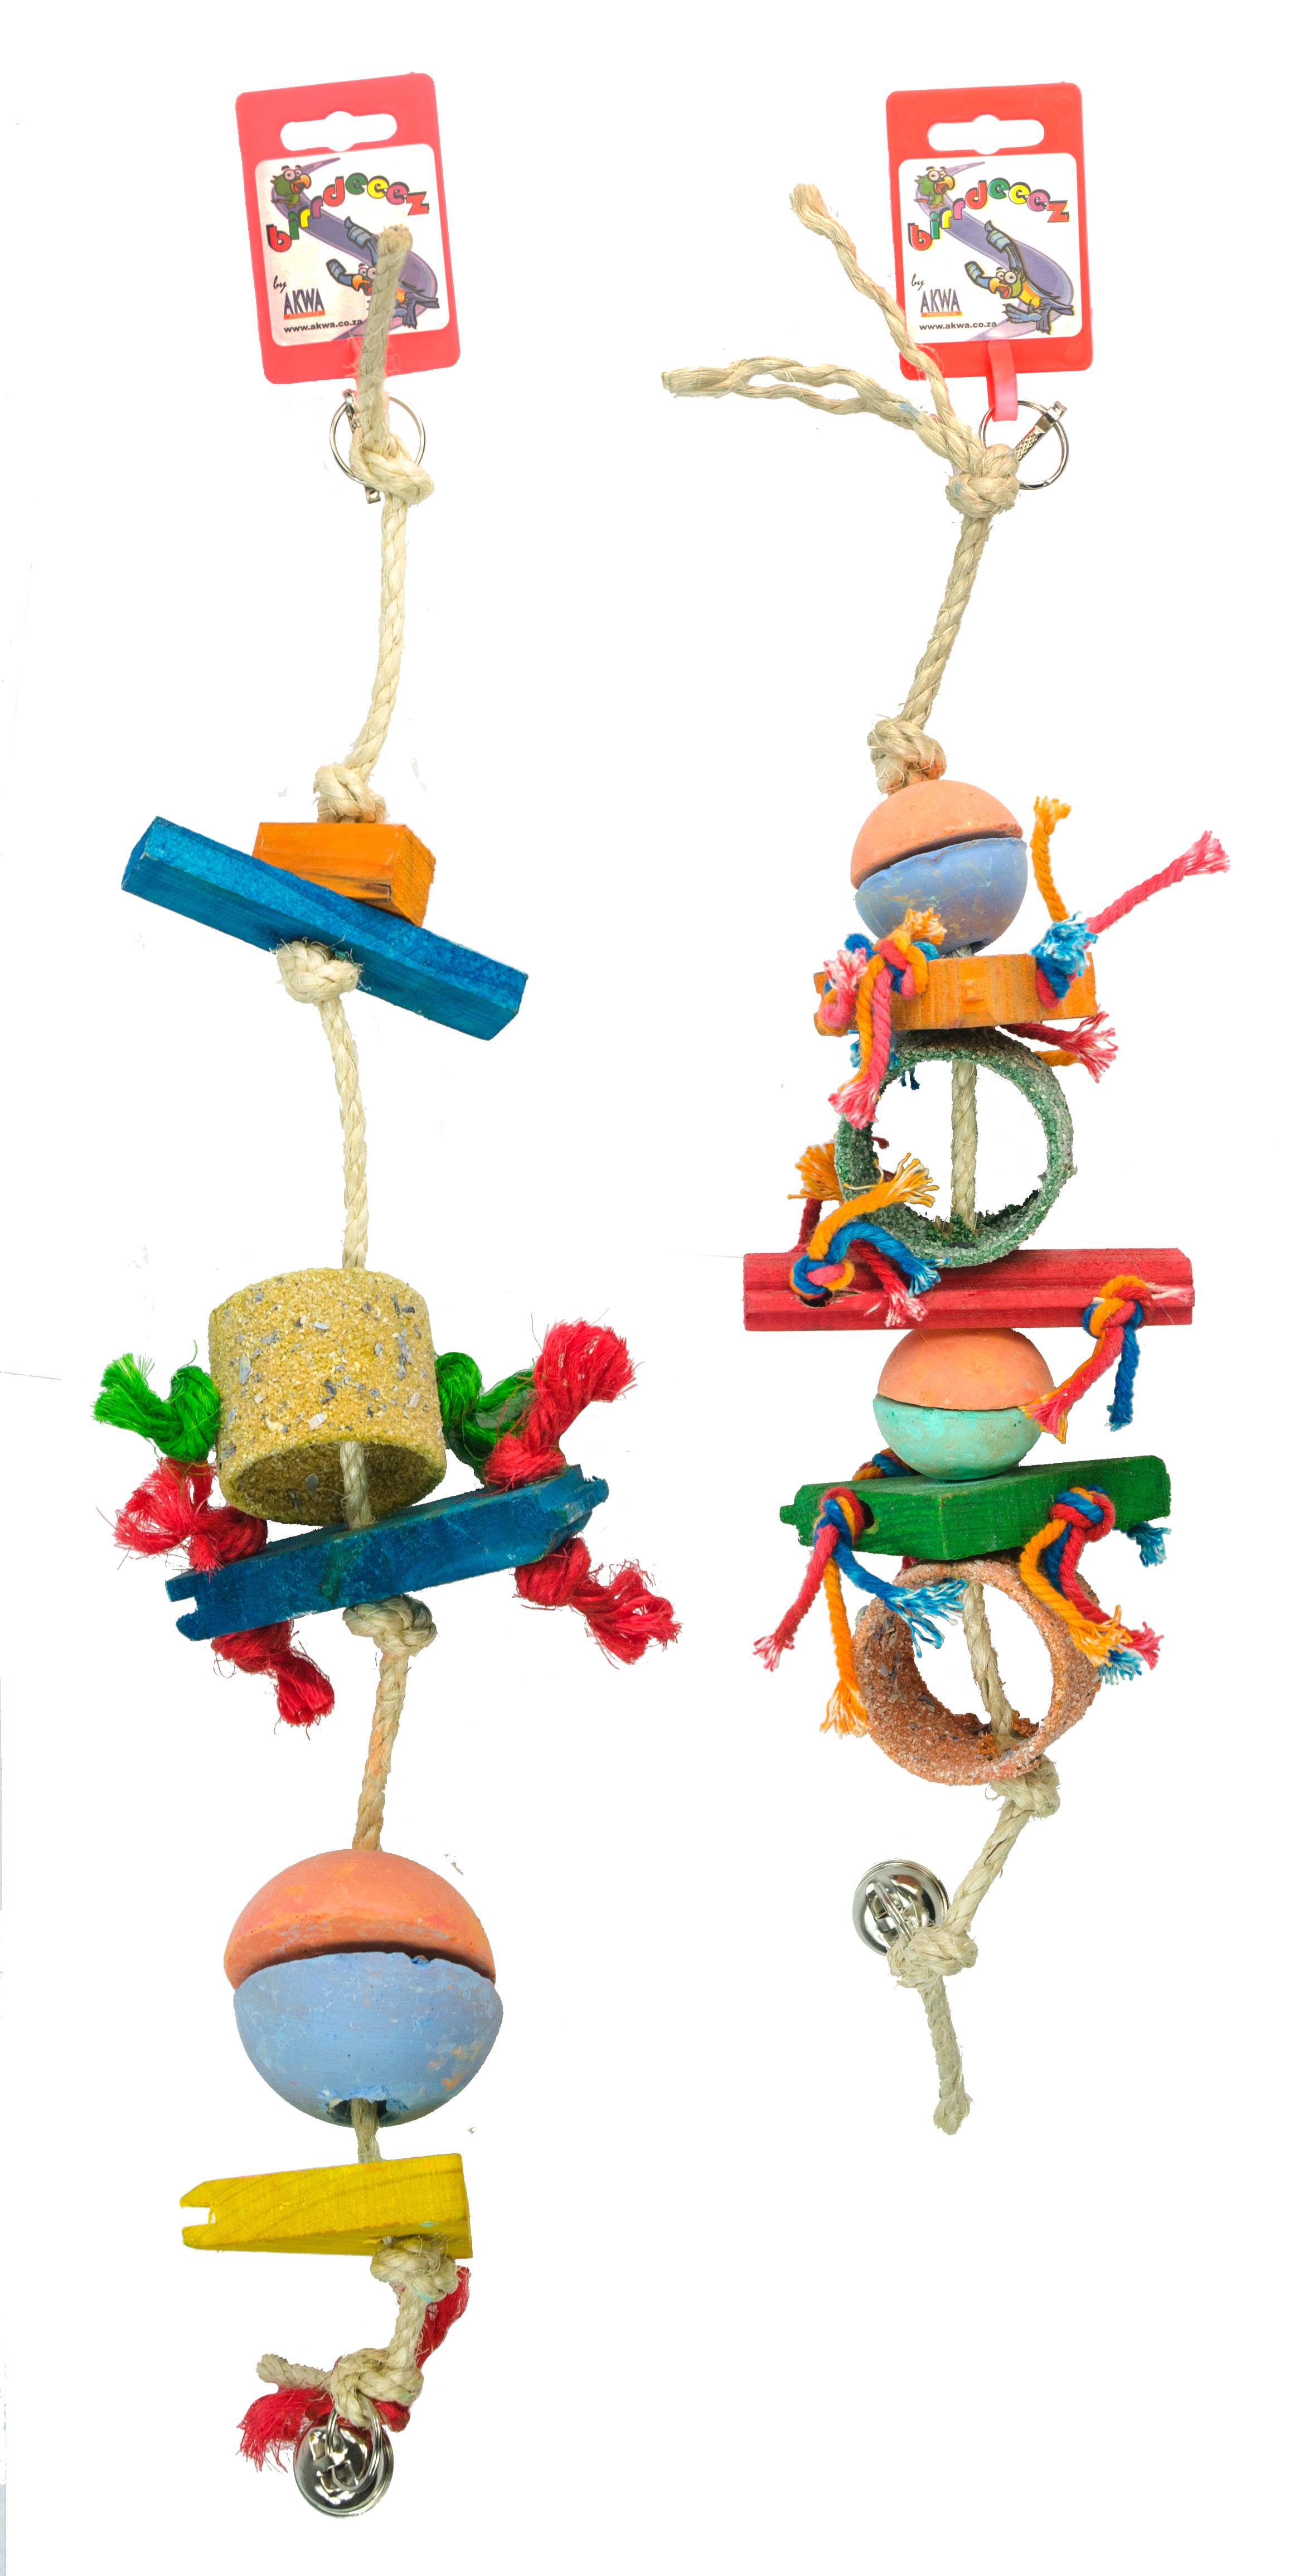 Birrdeeez Carnival Parrot Toy